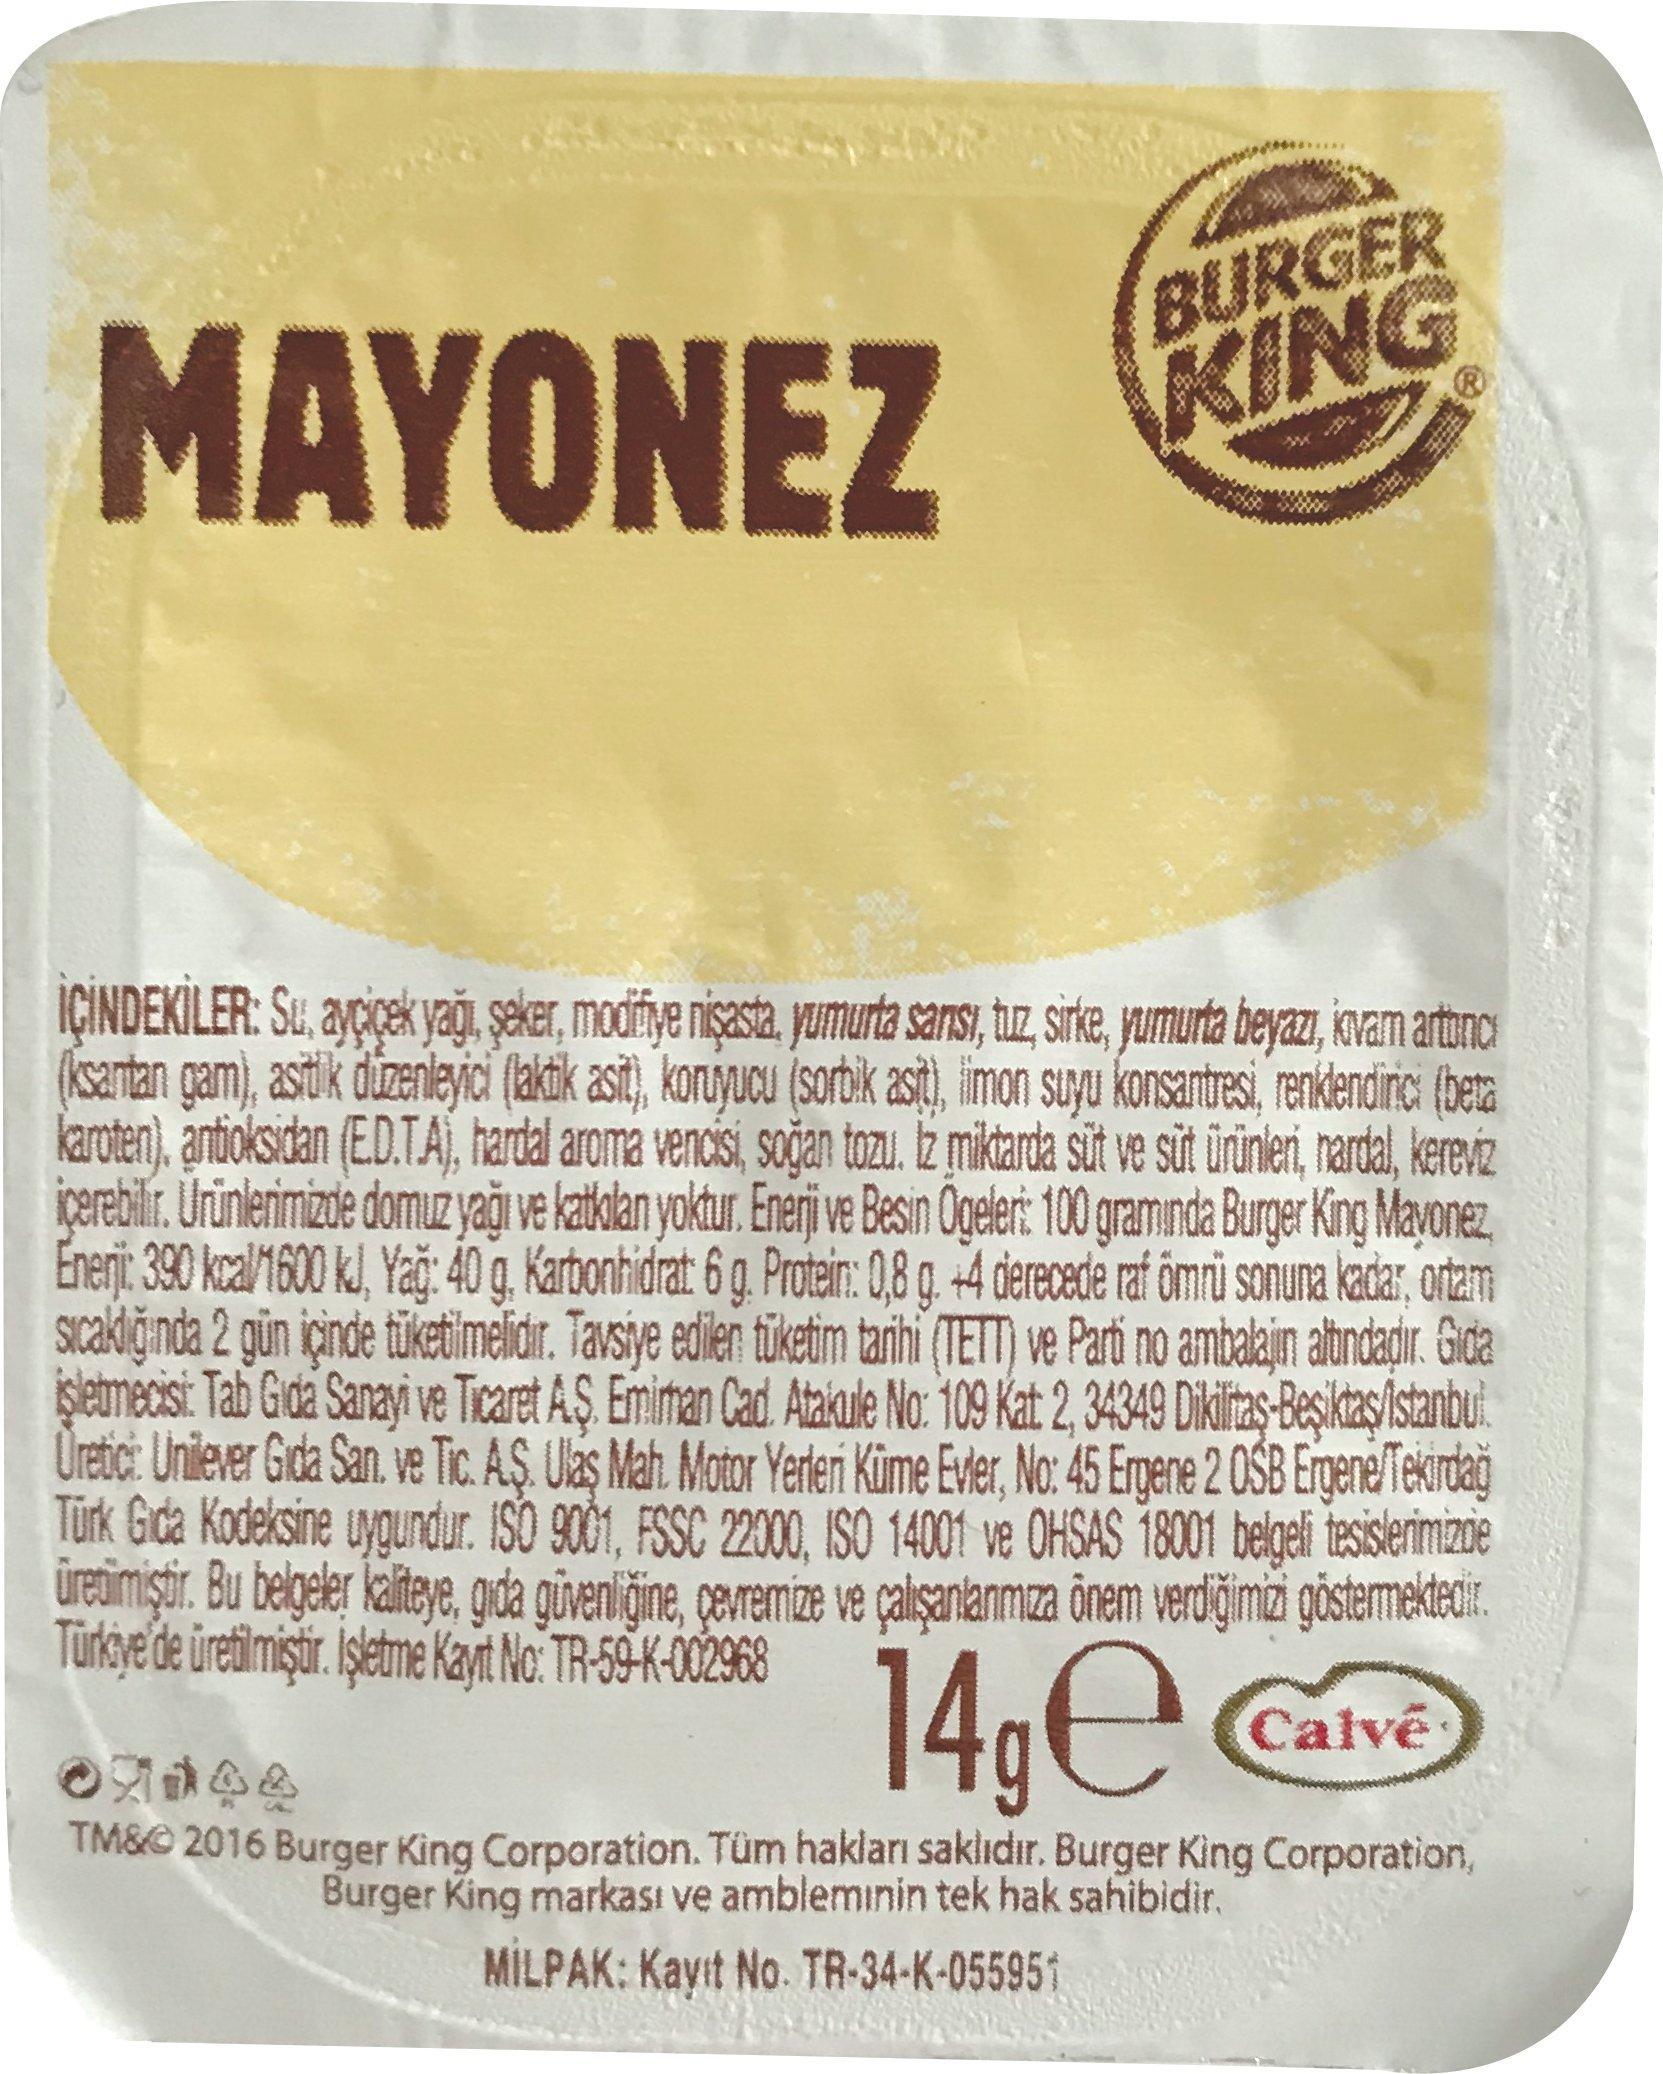 Burger King Mini Mayonez 14 G 120 Adet Unilever -